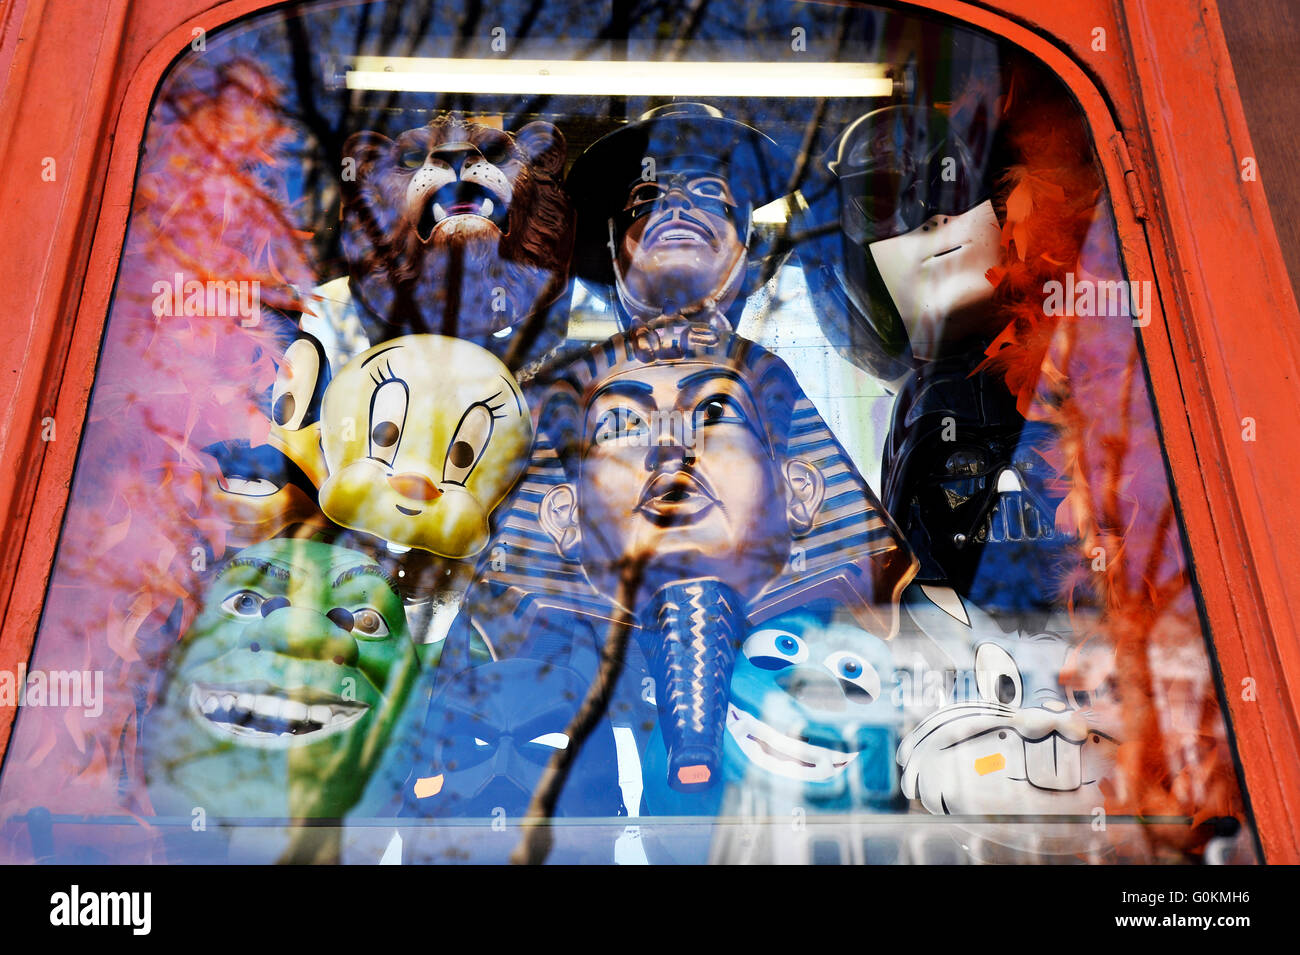 Dressing-up and joke shop in Paris - Stock Image